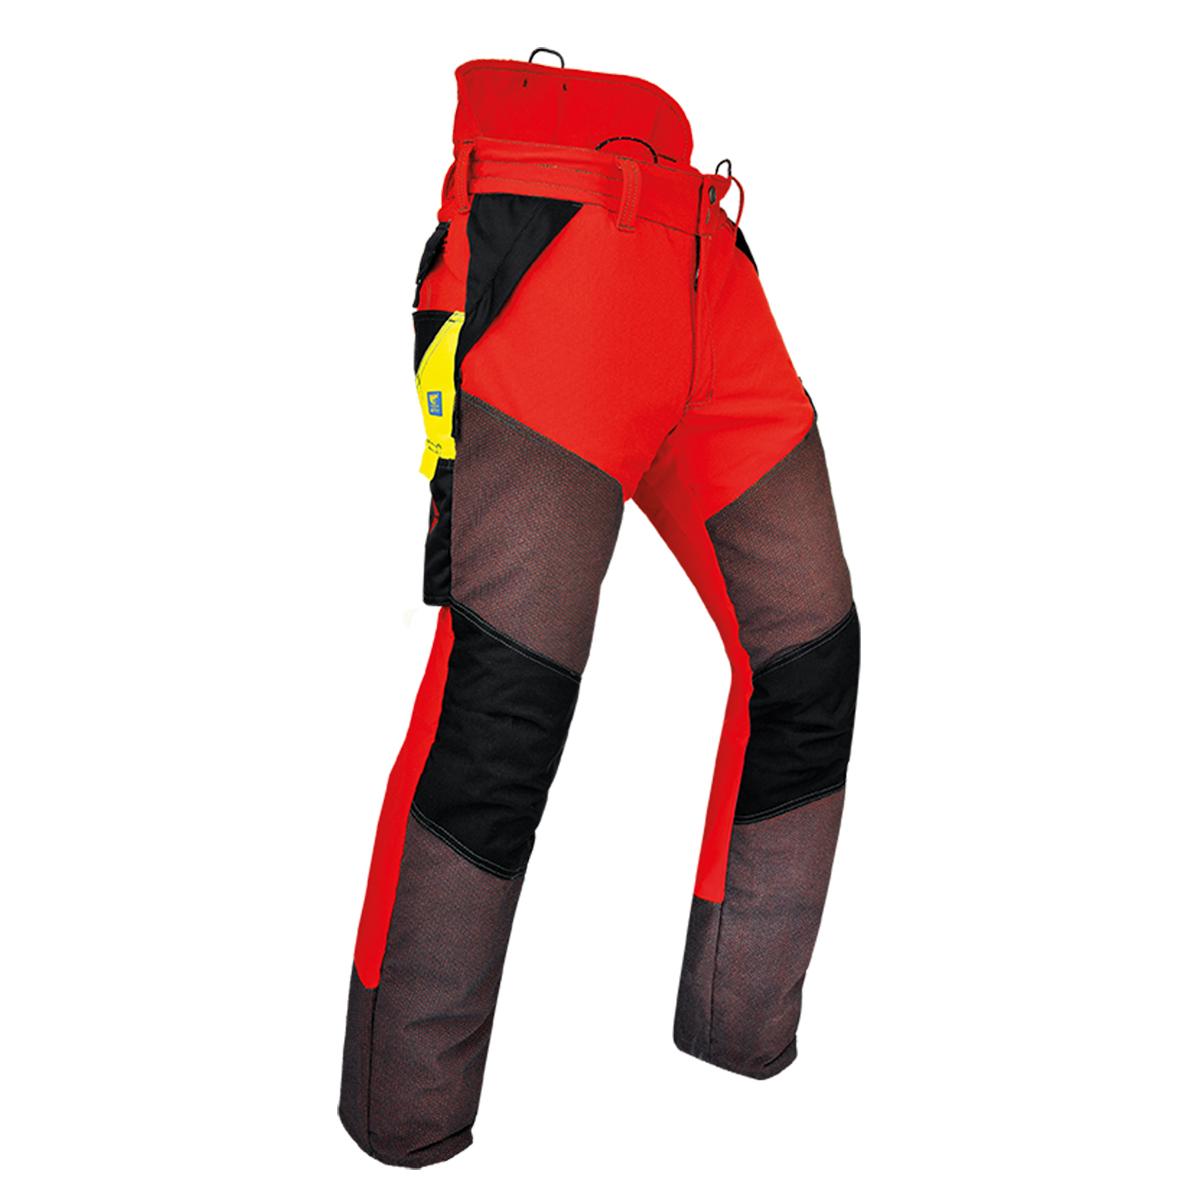 Pfanner pantalon Gladiator Extrem Anticoupure